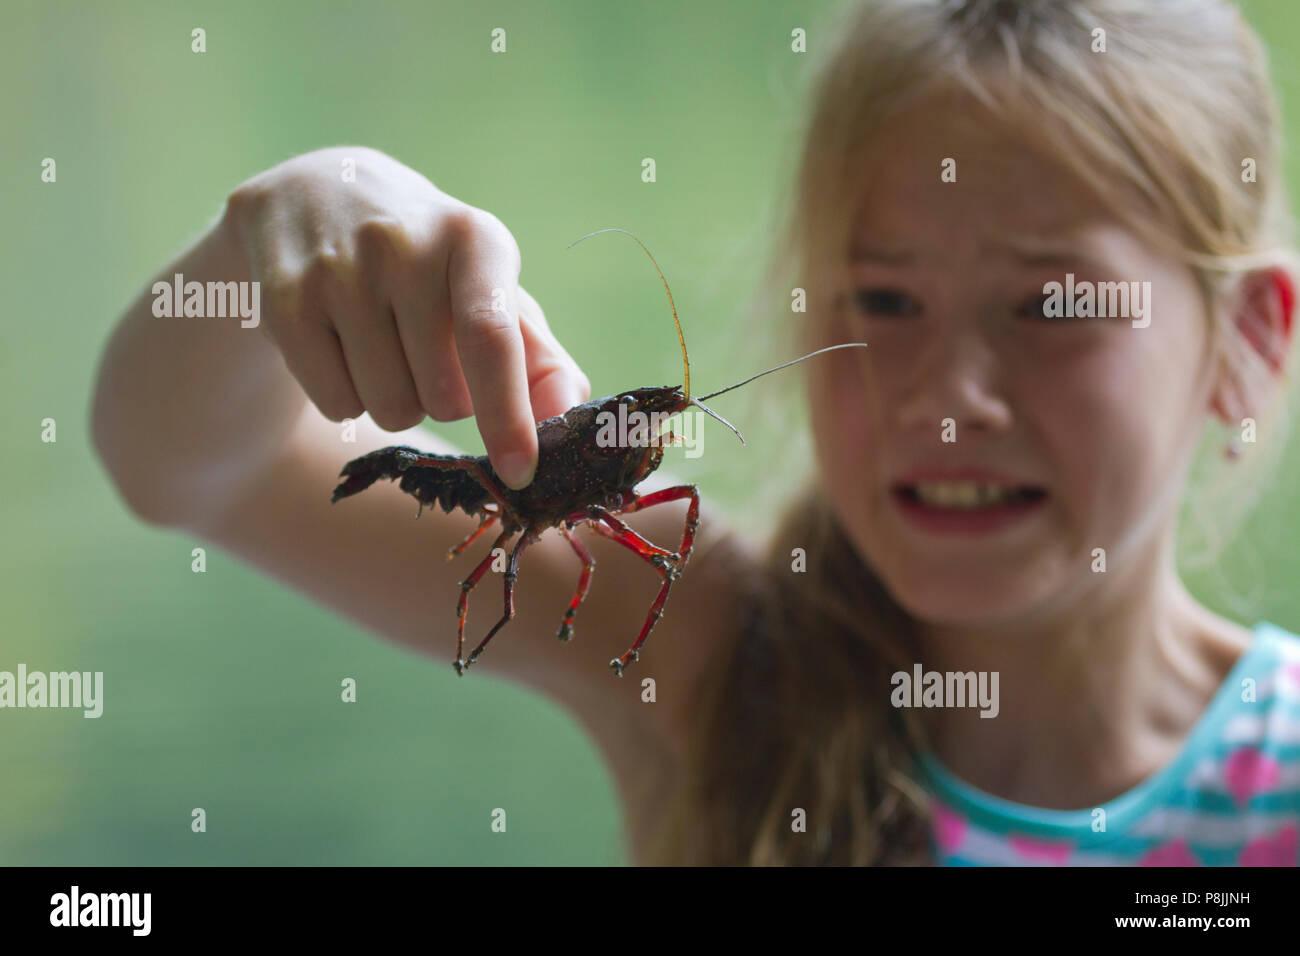 Chica con cangrejos de pantano rojo Foto de stock